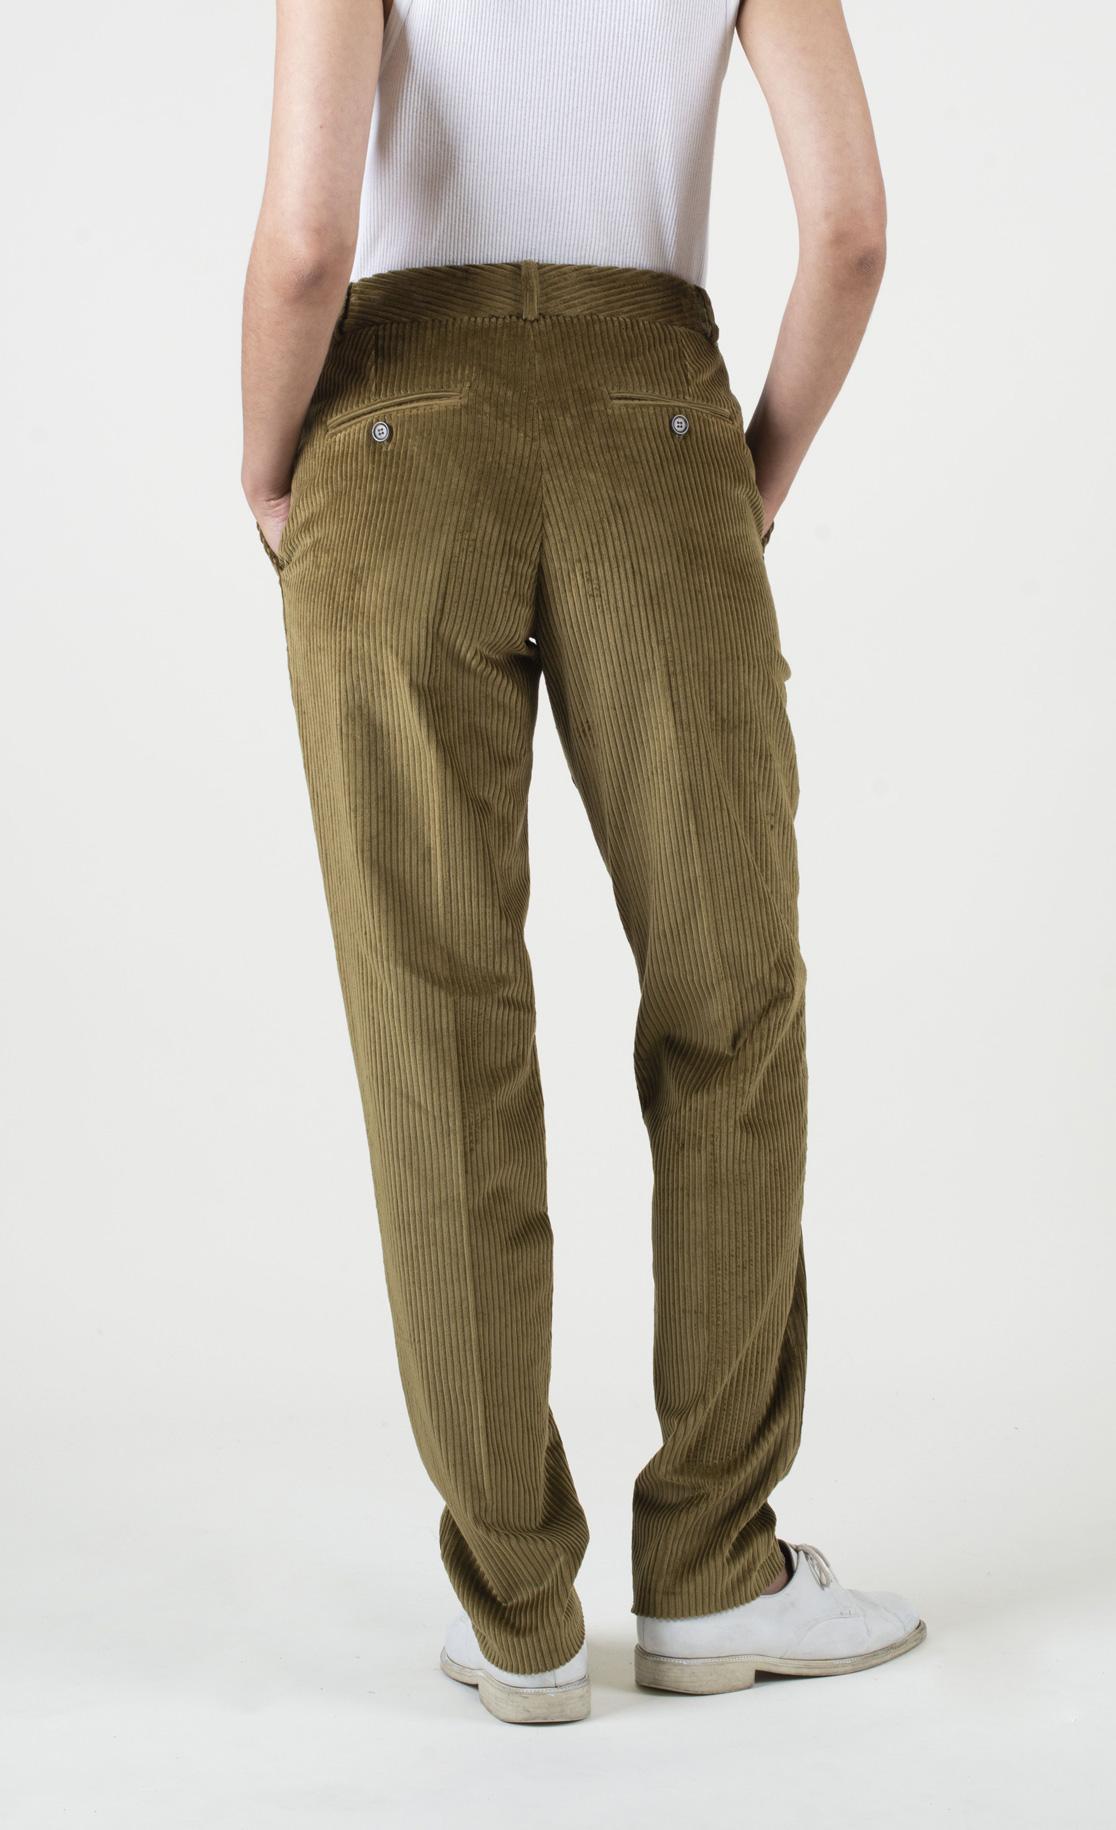 DADA-Diane-Ducasse-pantalon-slim-velours-bronze-dos